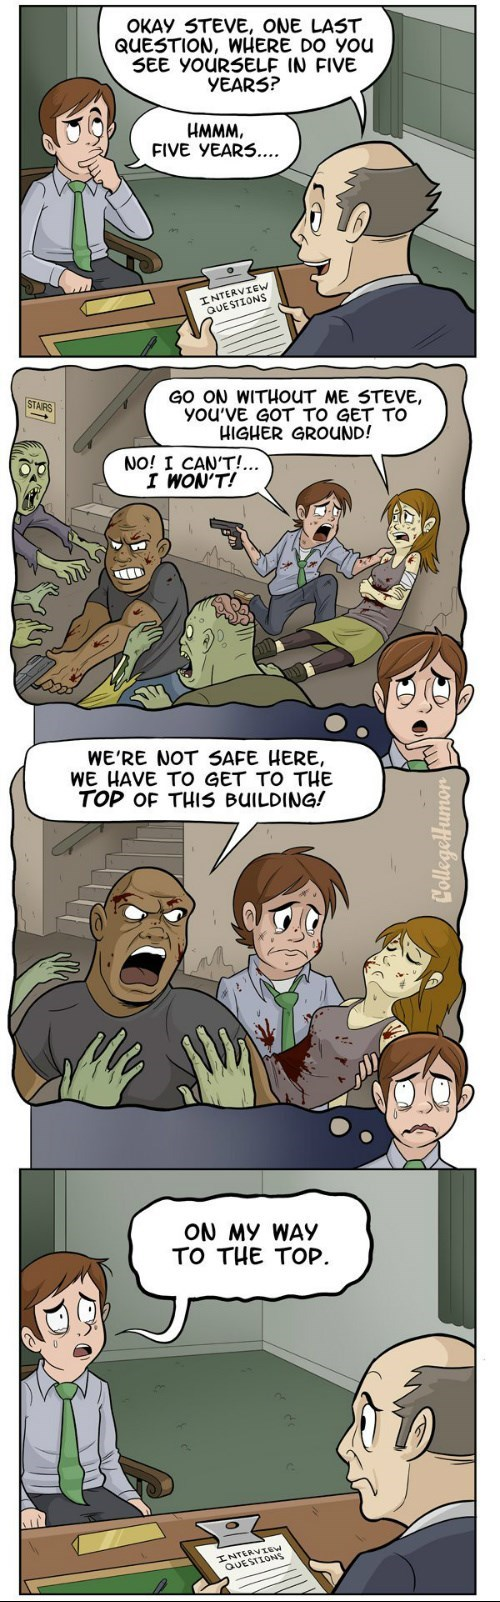 zombie,job interview,web comics